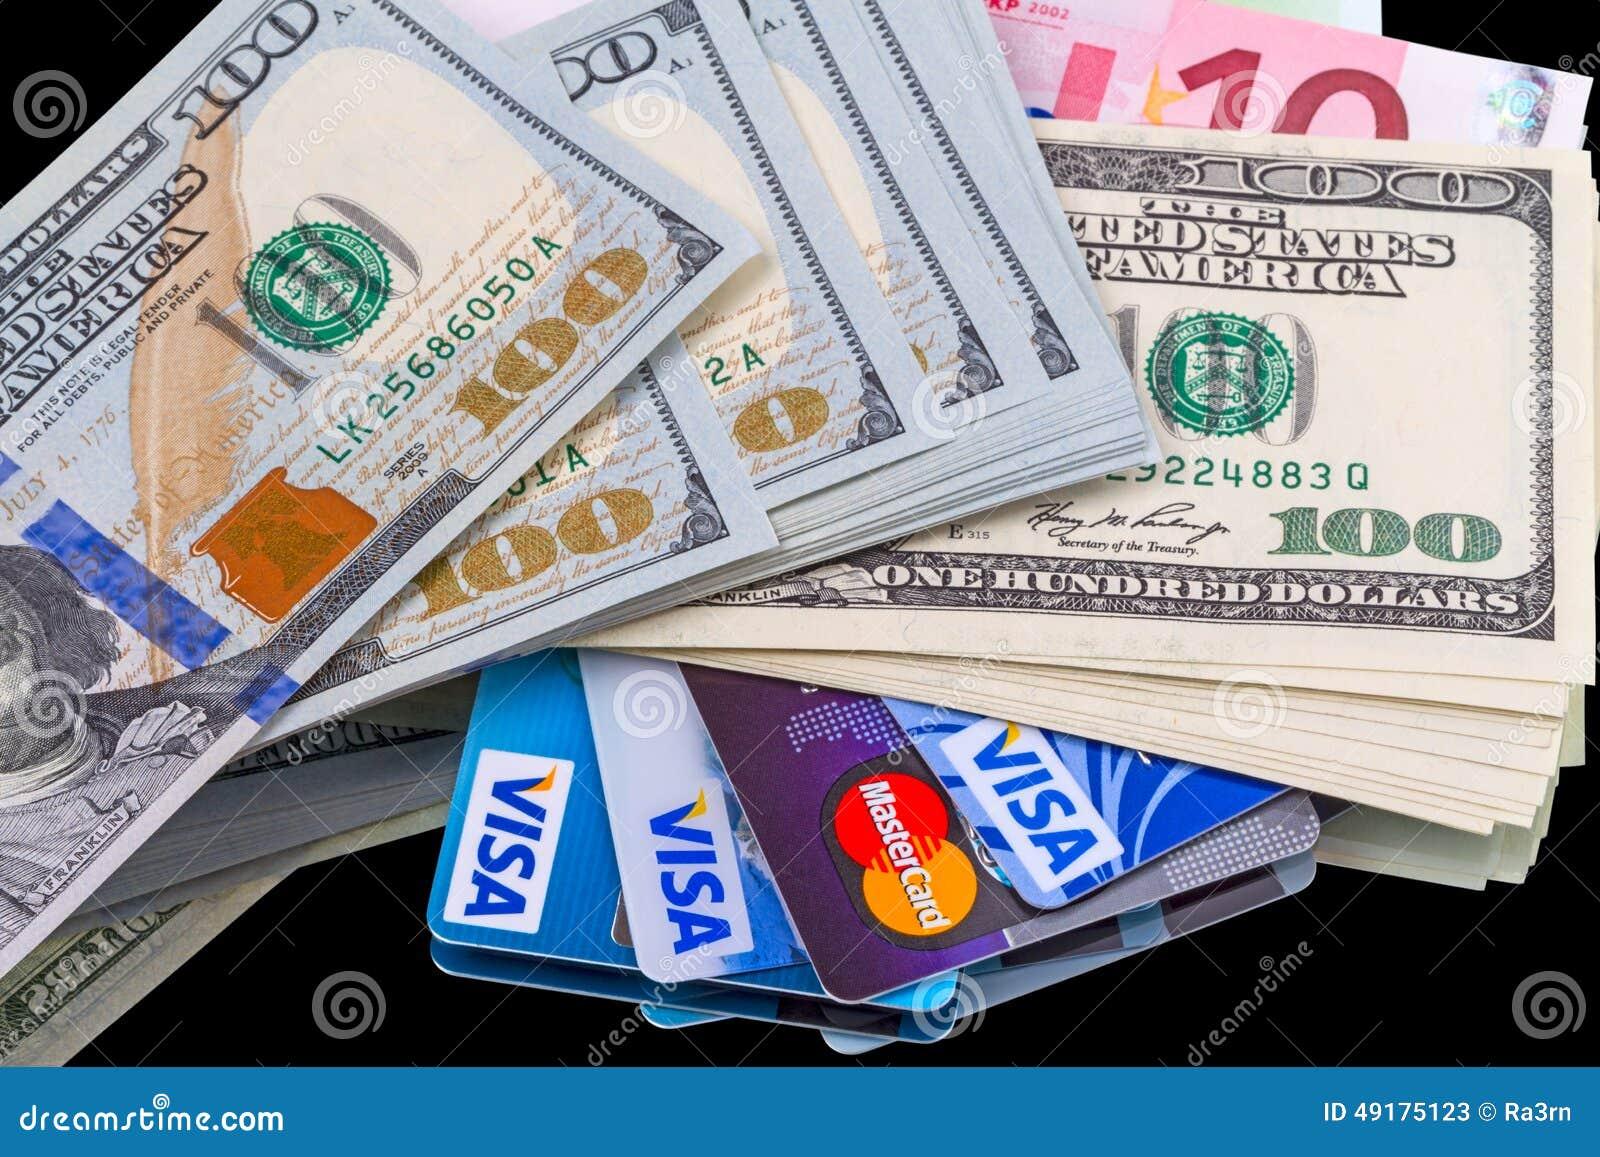 World Travel Credit Cards